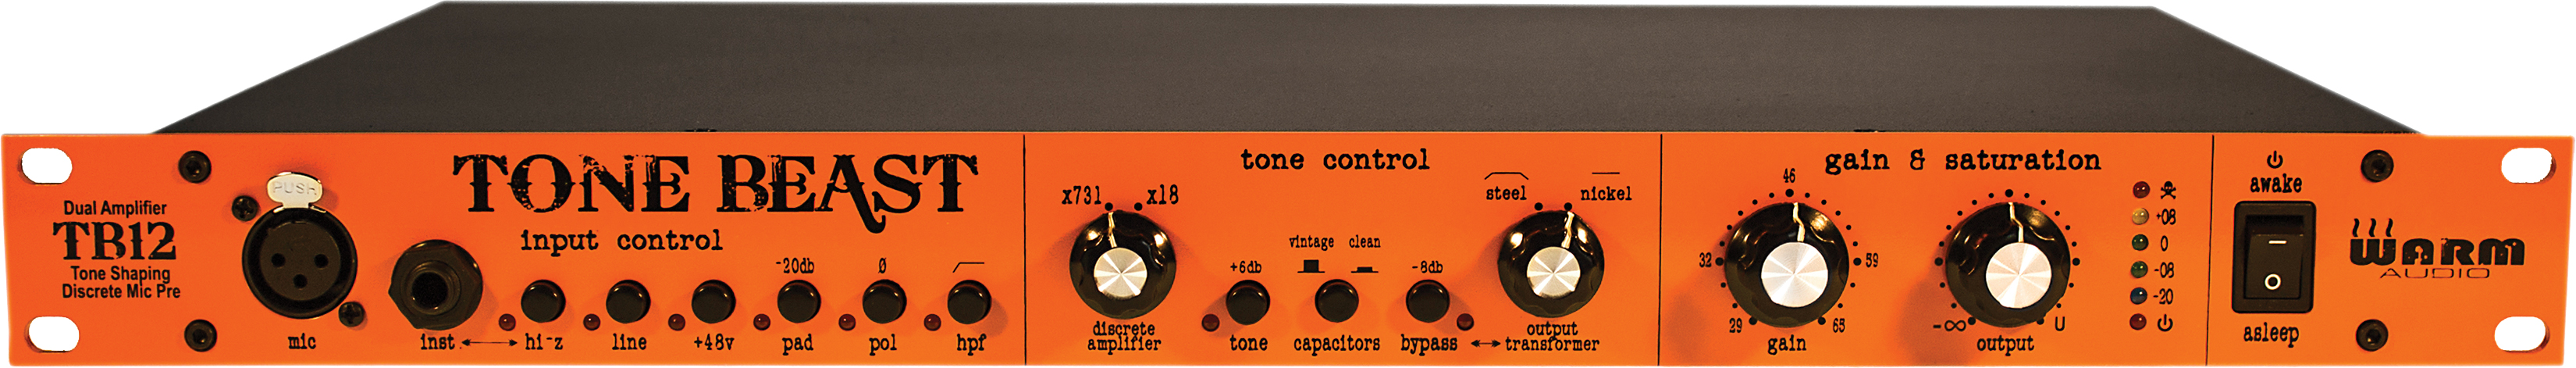 warm audio tone beast review musictech. Black Bedroom Furniture Sets. Home Design Ideas